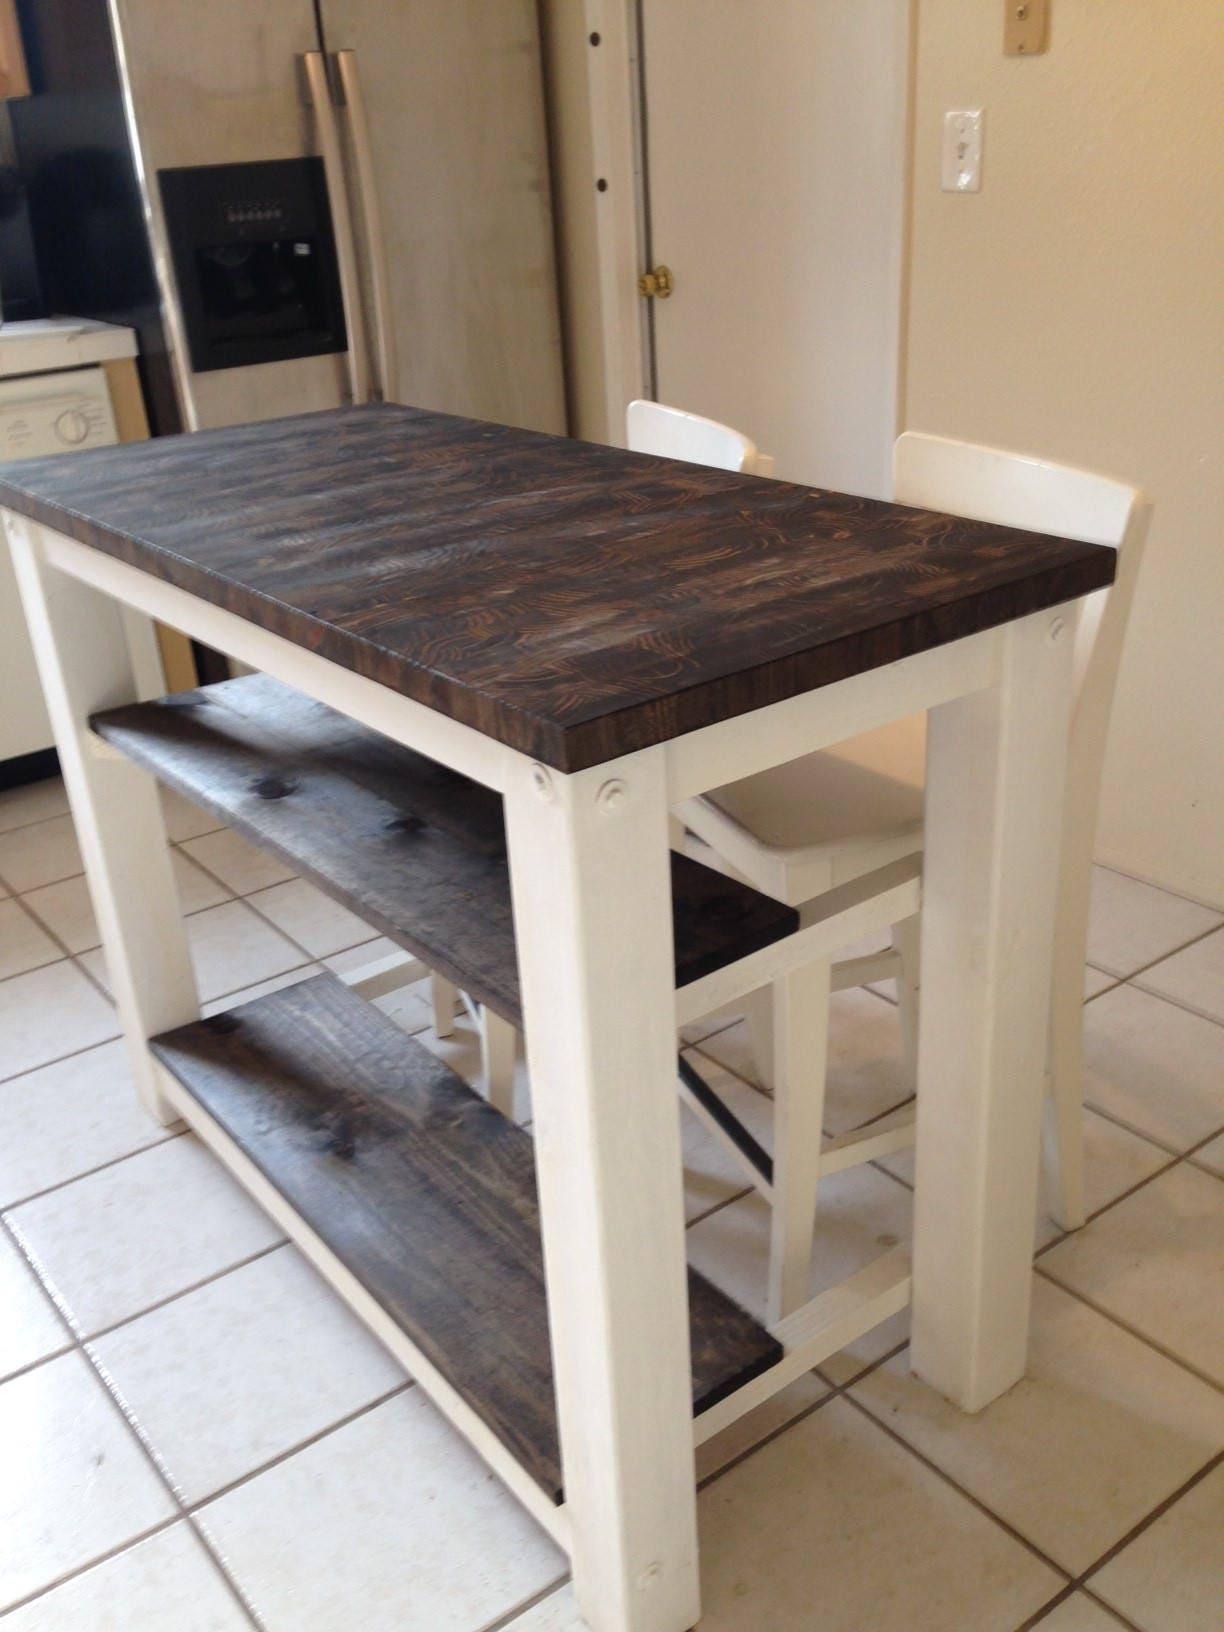 2 half shelves End Grain Kitchen Island butcher block top with